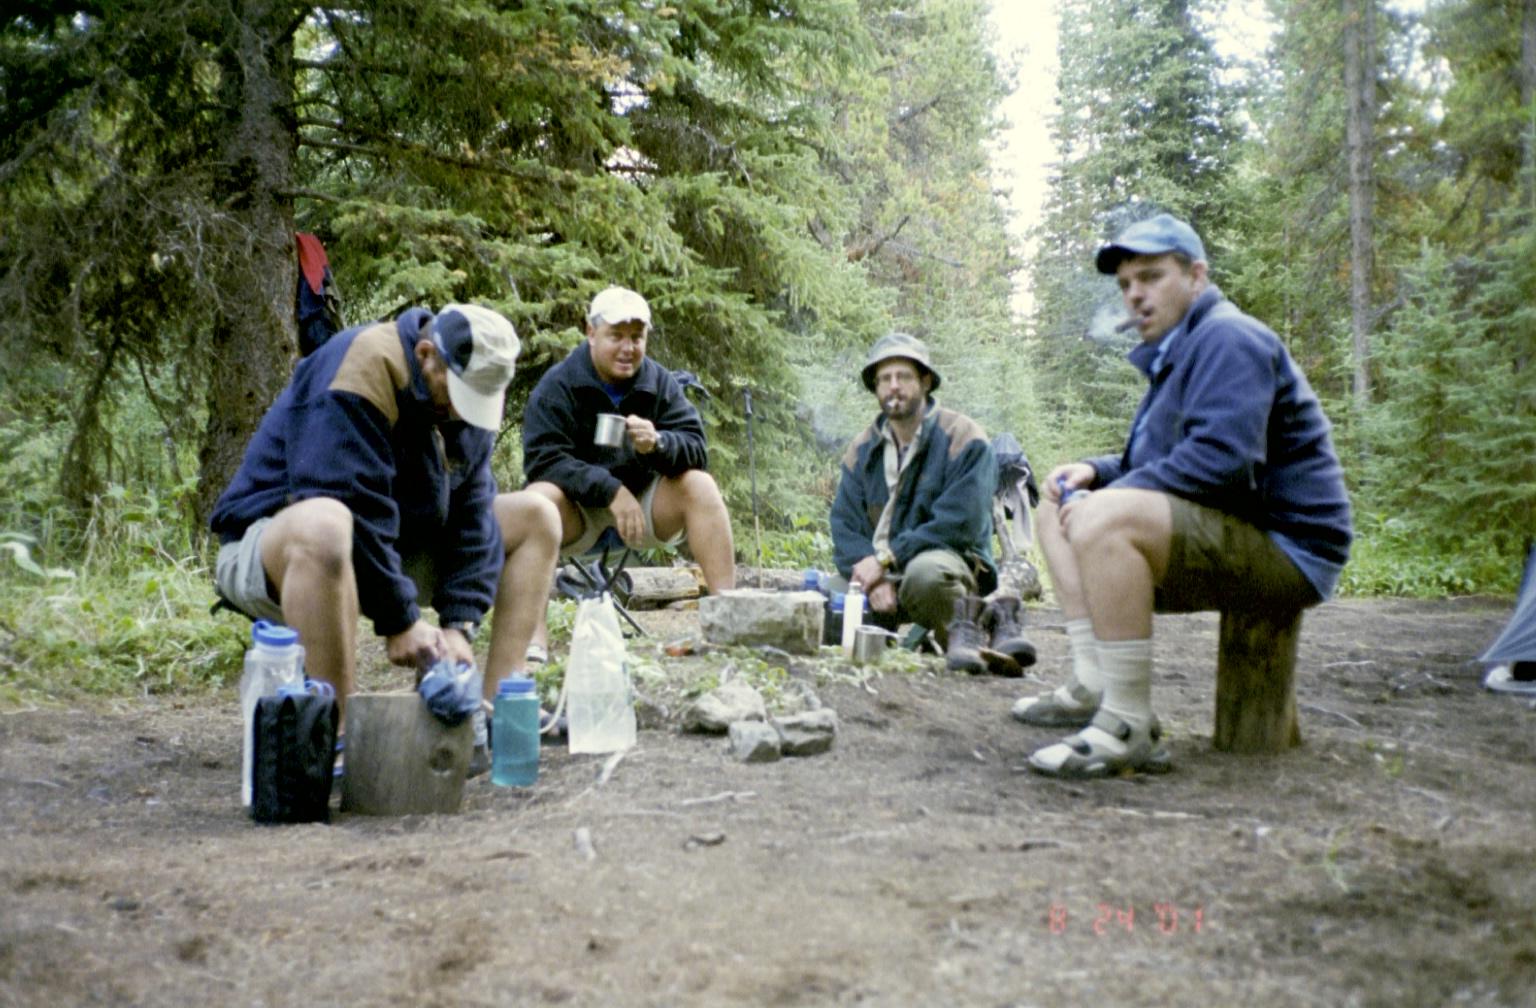 The Fixit Boyz at Camp